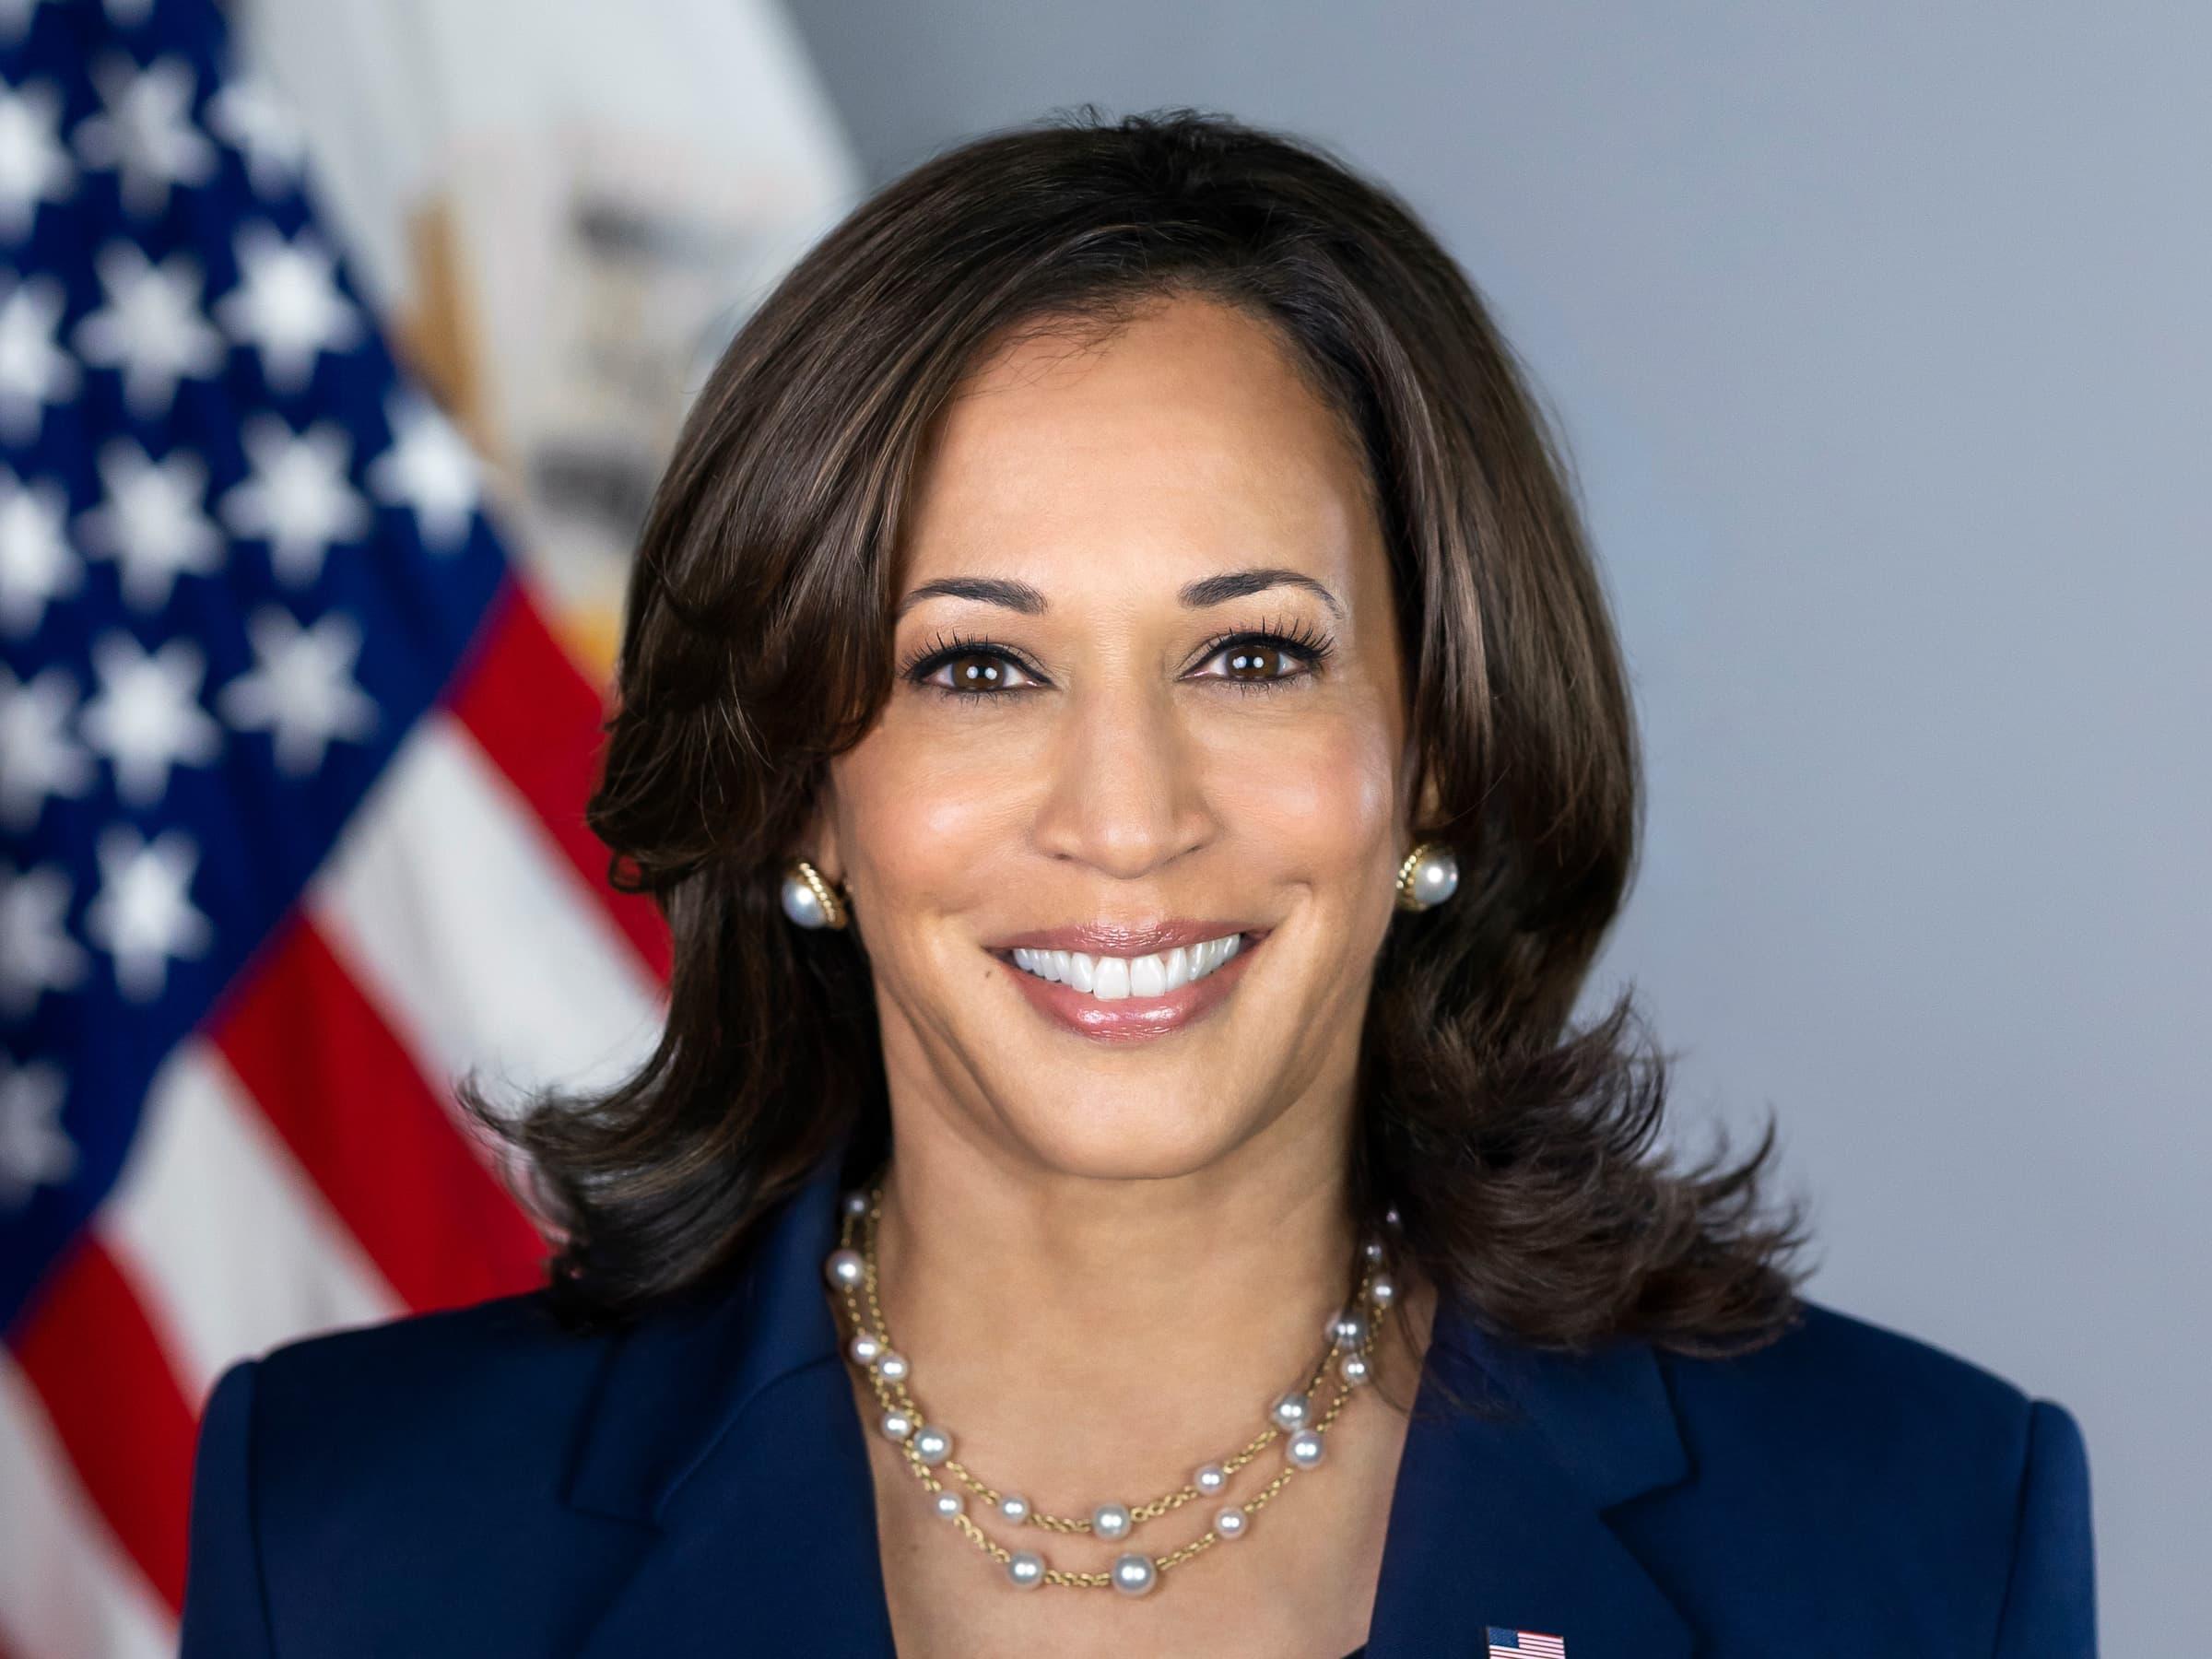 Image is a portrait of Vice-President Kamala Harris